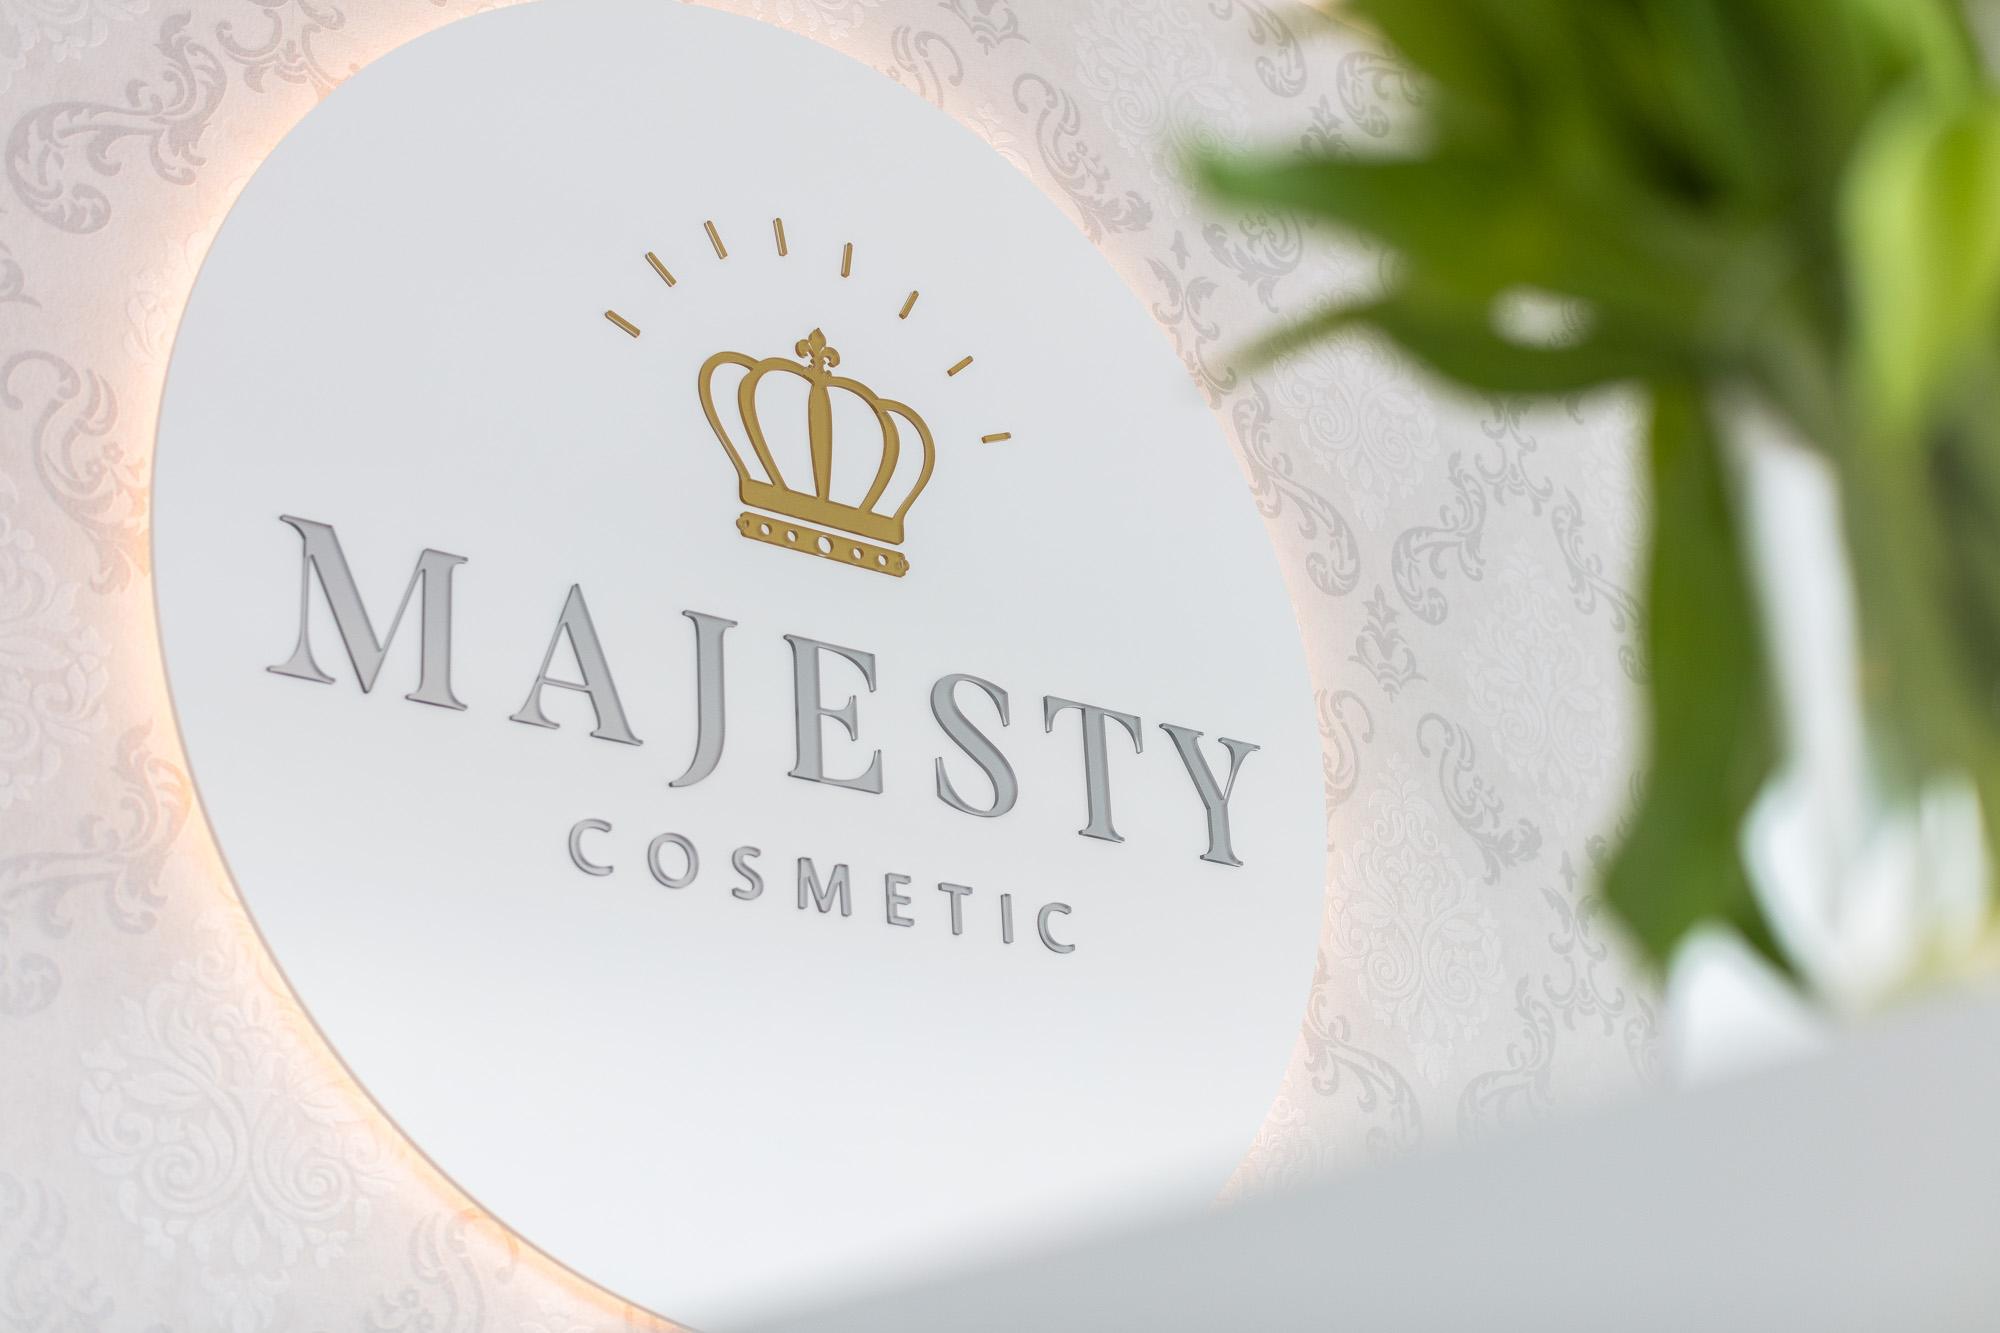 Majesty Cosmetic Oftringen_54